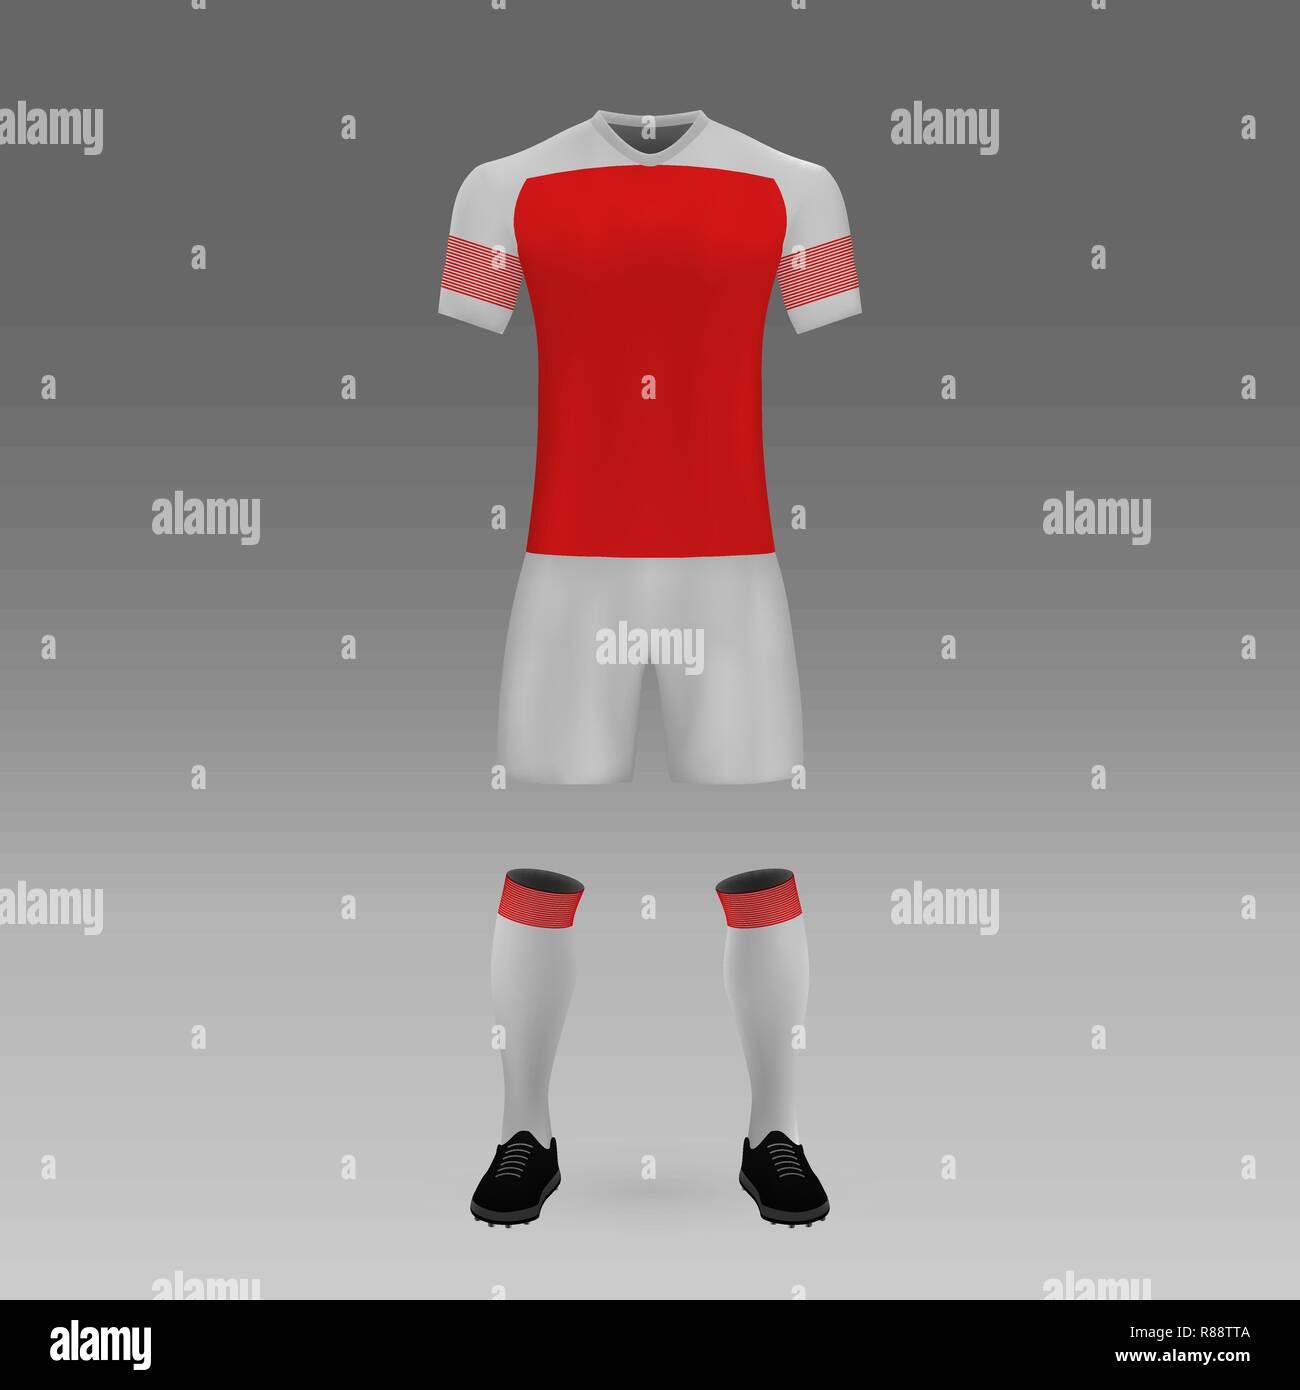 sports shoes 7d45a 418e4 football kit Arsenal, London, shirt template for soccer ...